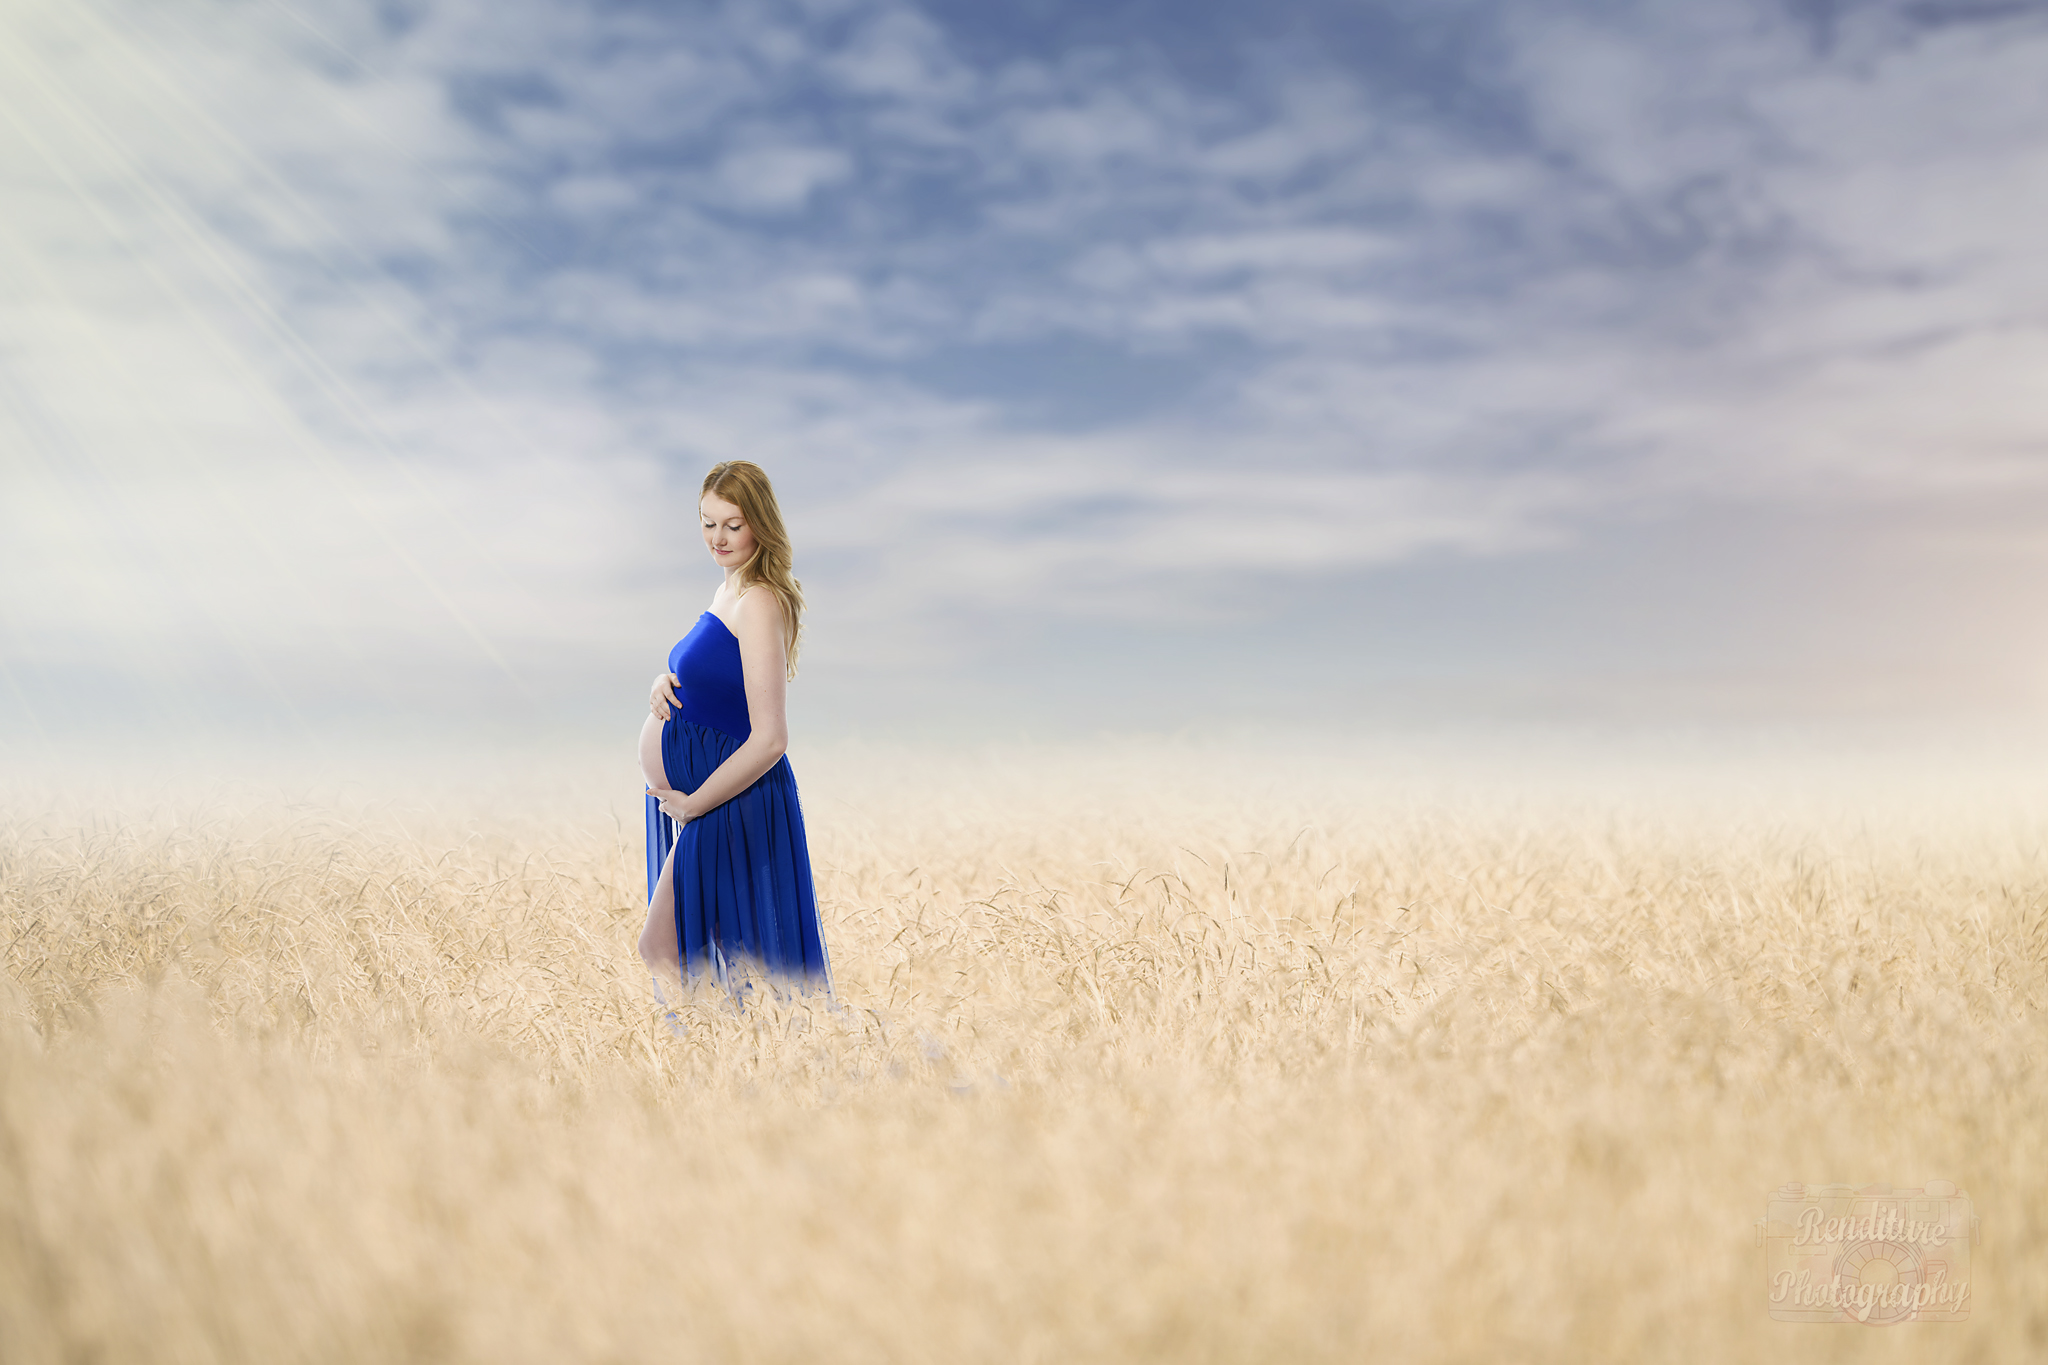 Saskatoon-Newborn-Family-Renditure-Photography-Photographer-Maternity-Pregnancy-Saskatchewan-527FBR.jpg